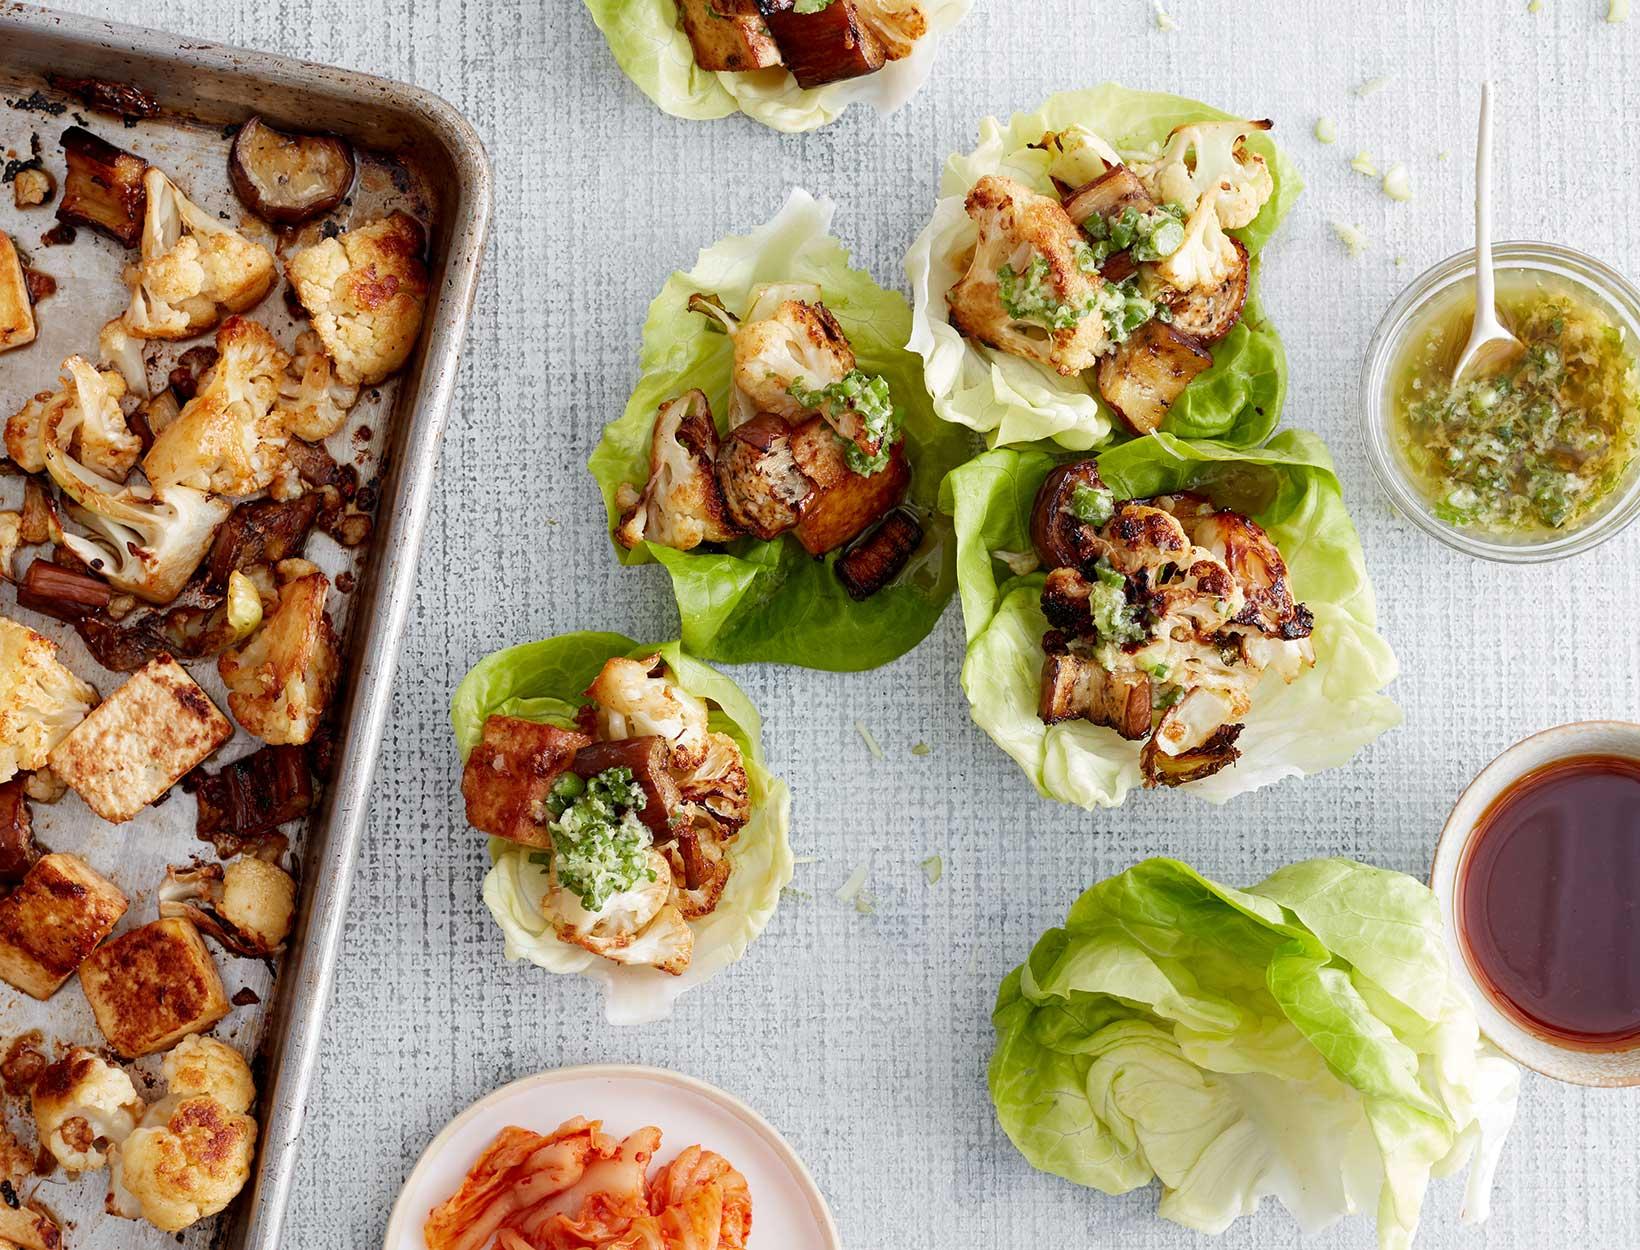 Eggplant, Cauliflower, and Tofu Ssam-Style LettuceCups